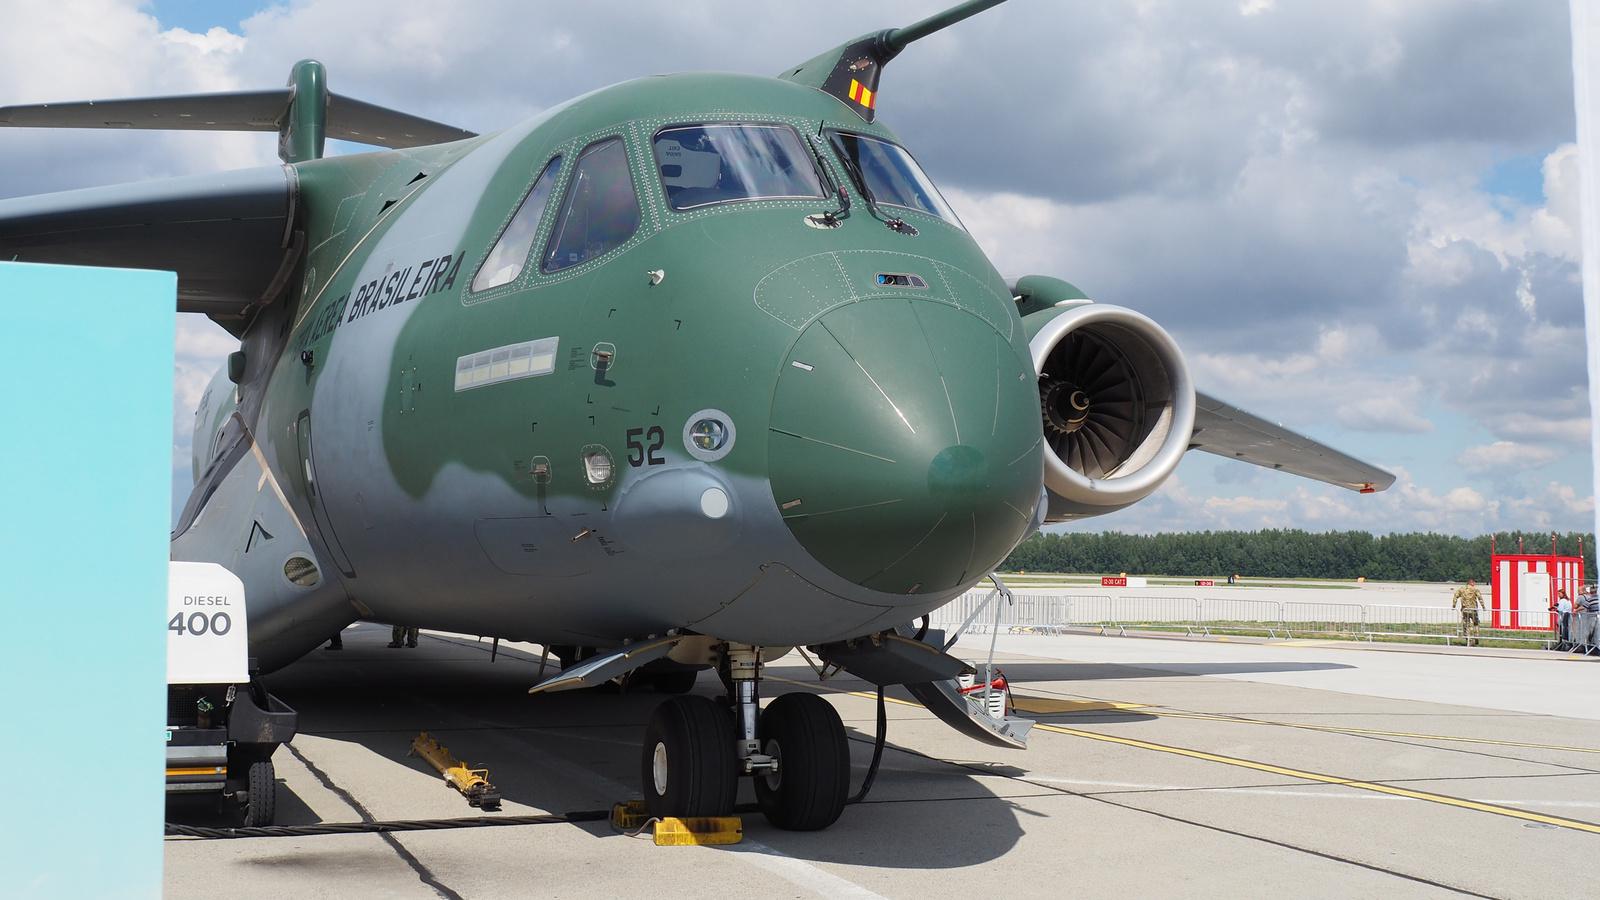 Força Aérea Brasileira (FAB) Embraer KC-390, SzG3